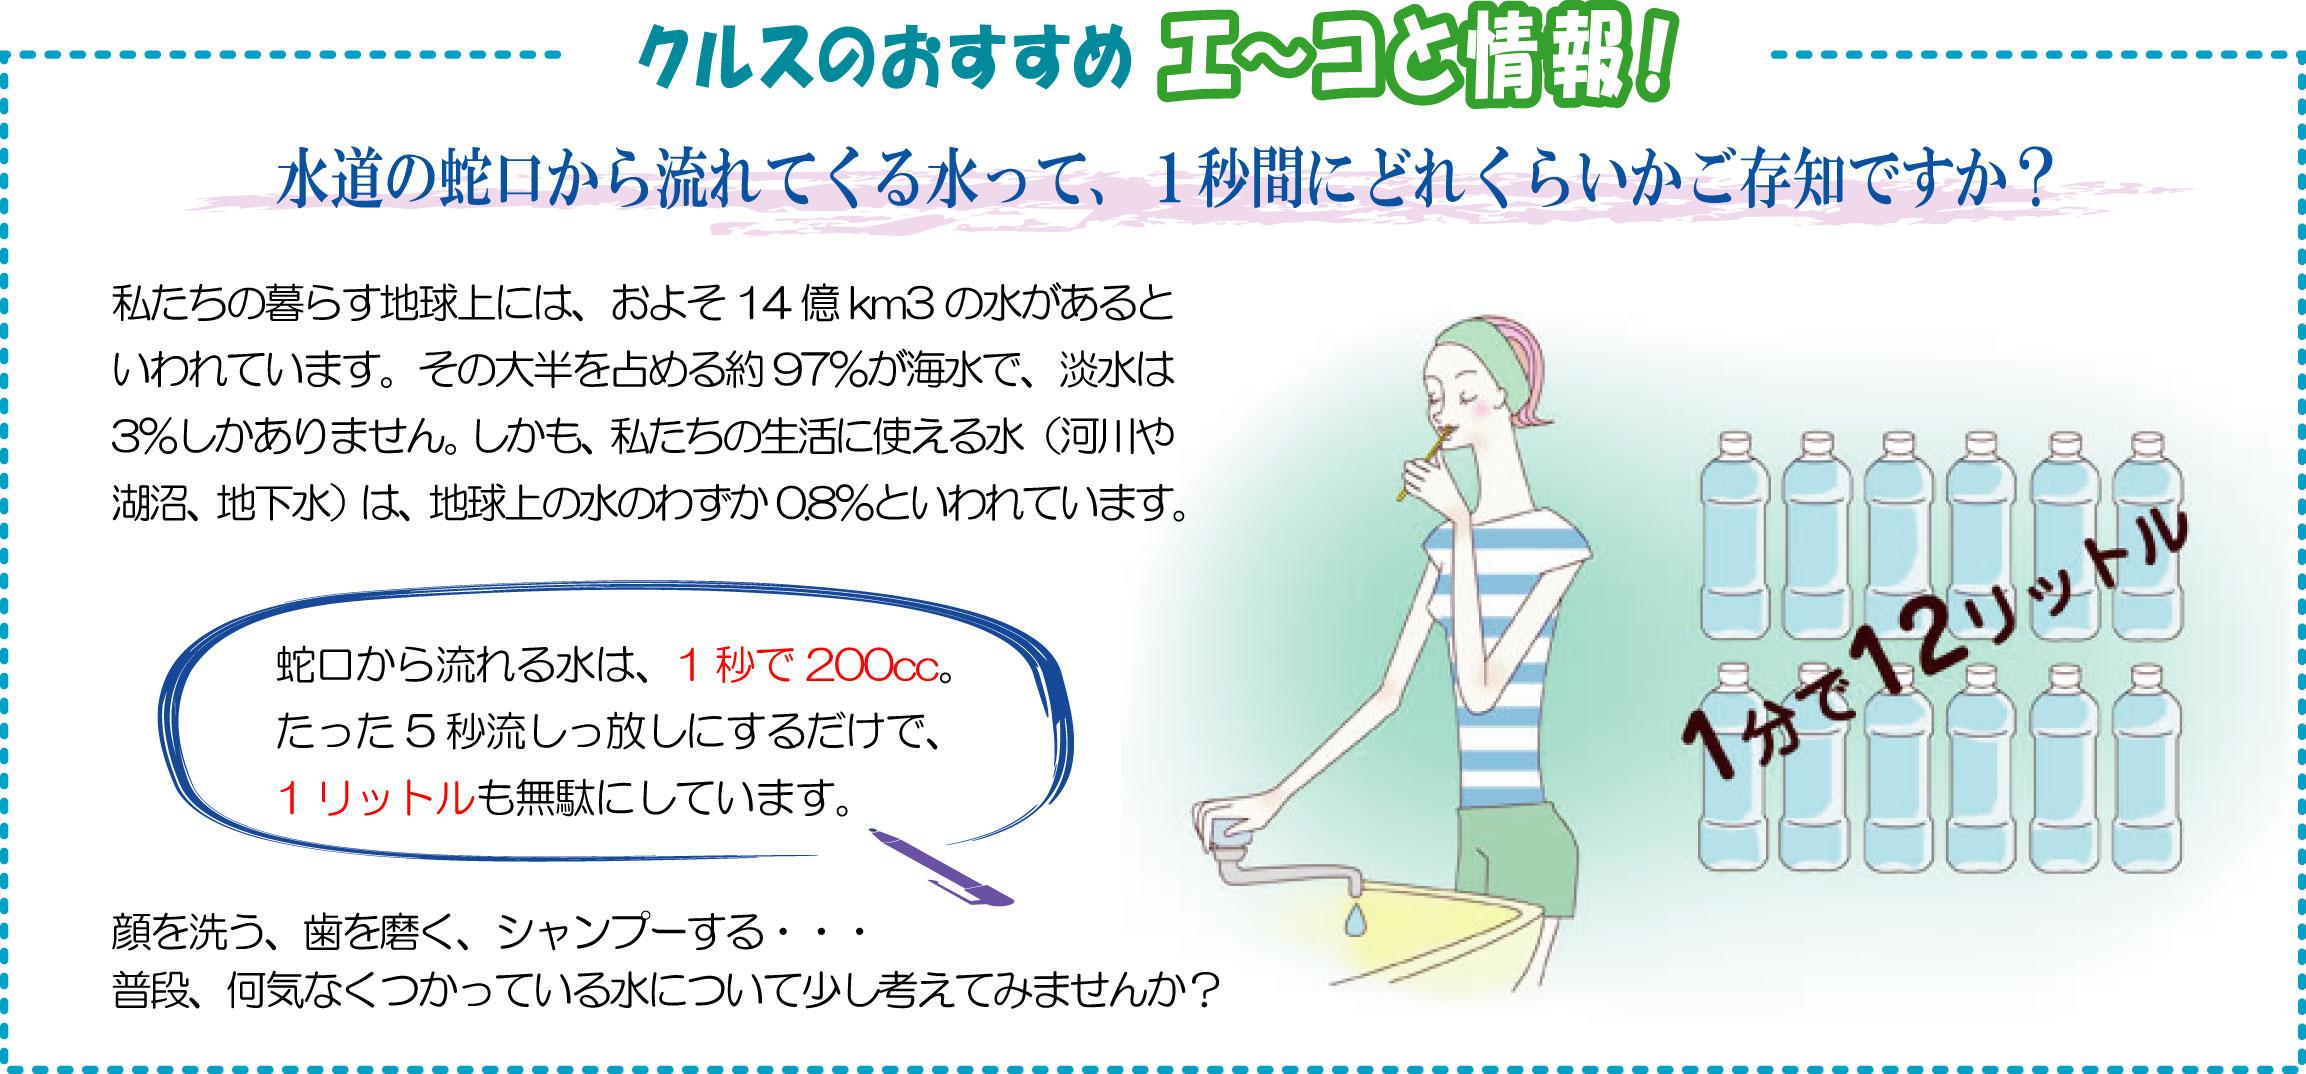 KuraSi-natu-sin63-13.jpg